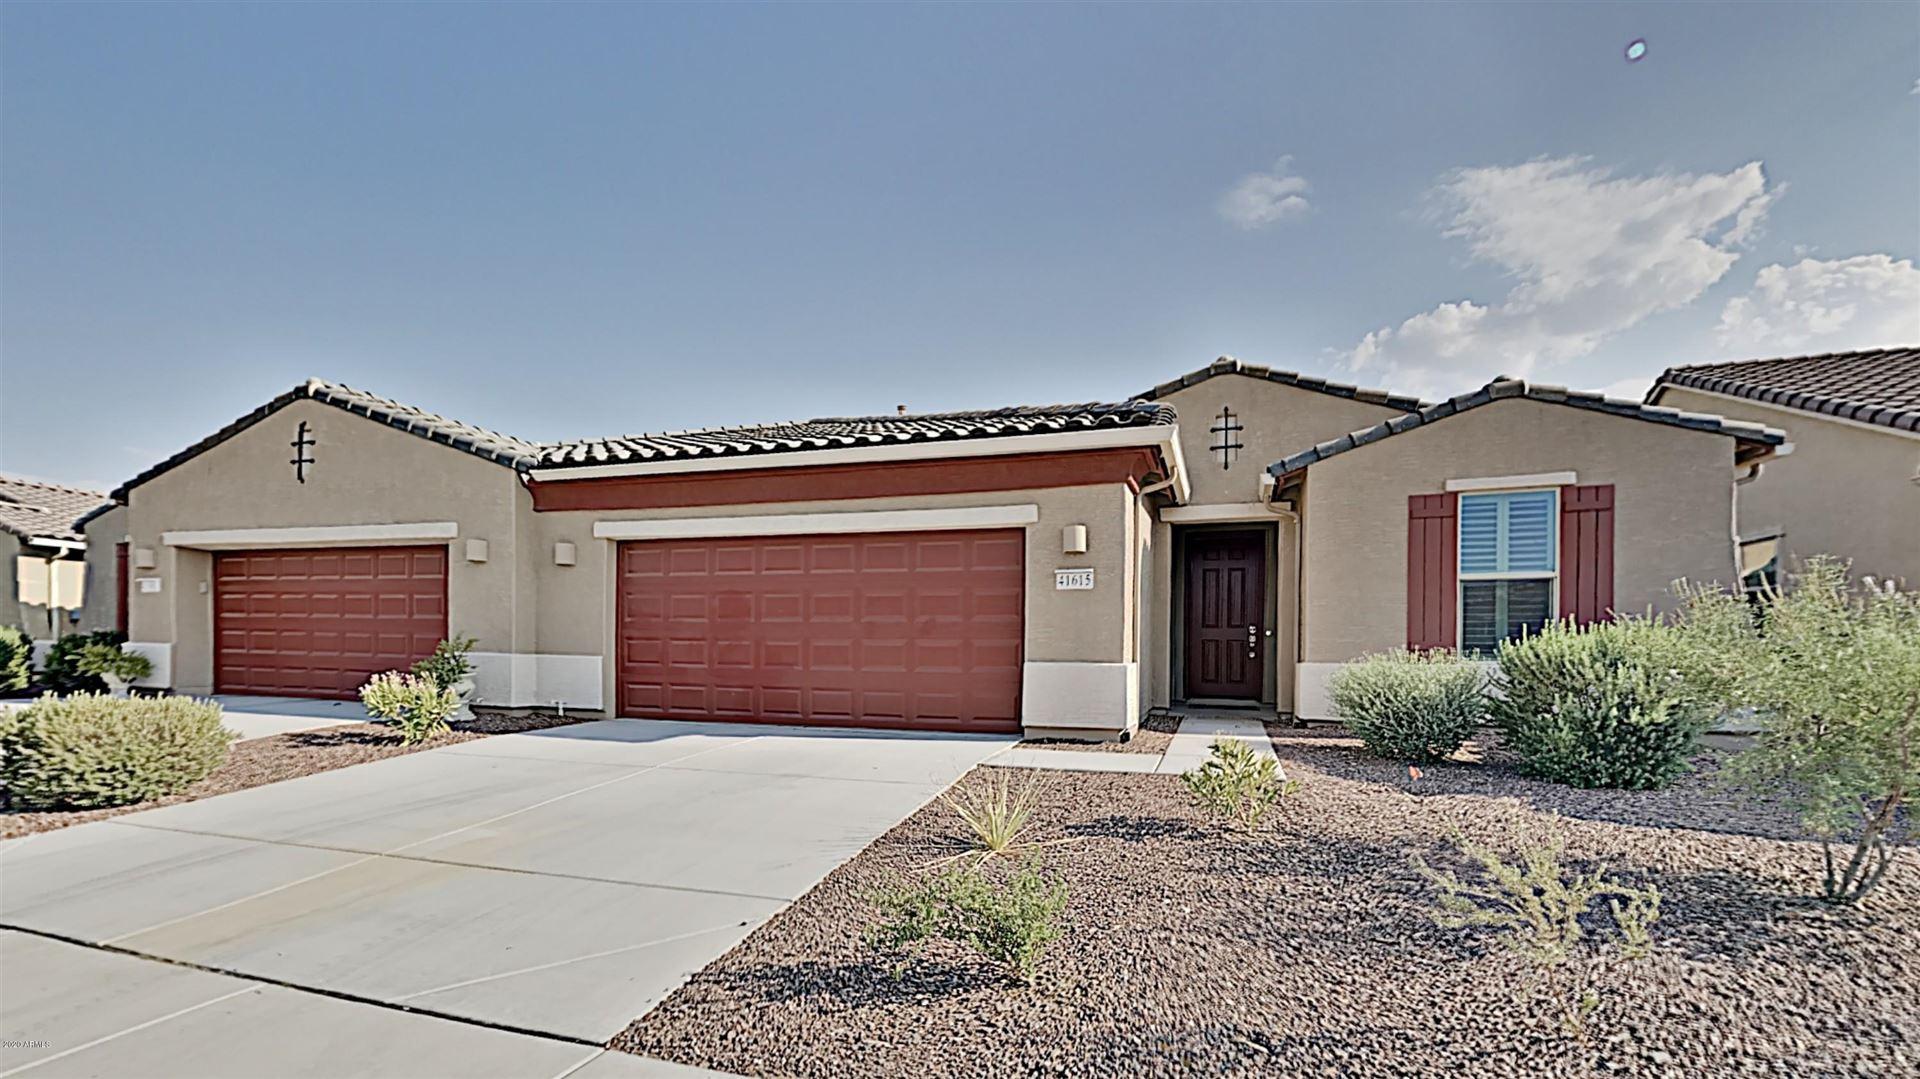 41615 W CALIENTE Drive, Maricopa, AZ 85138 - MLS#: 6125161